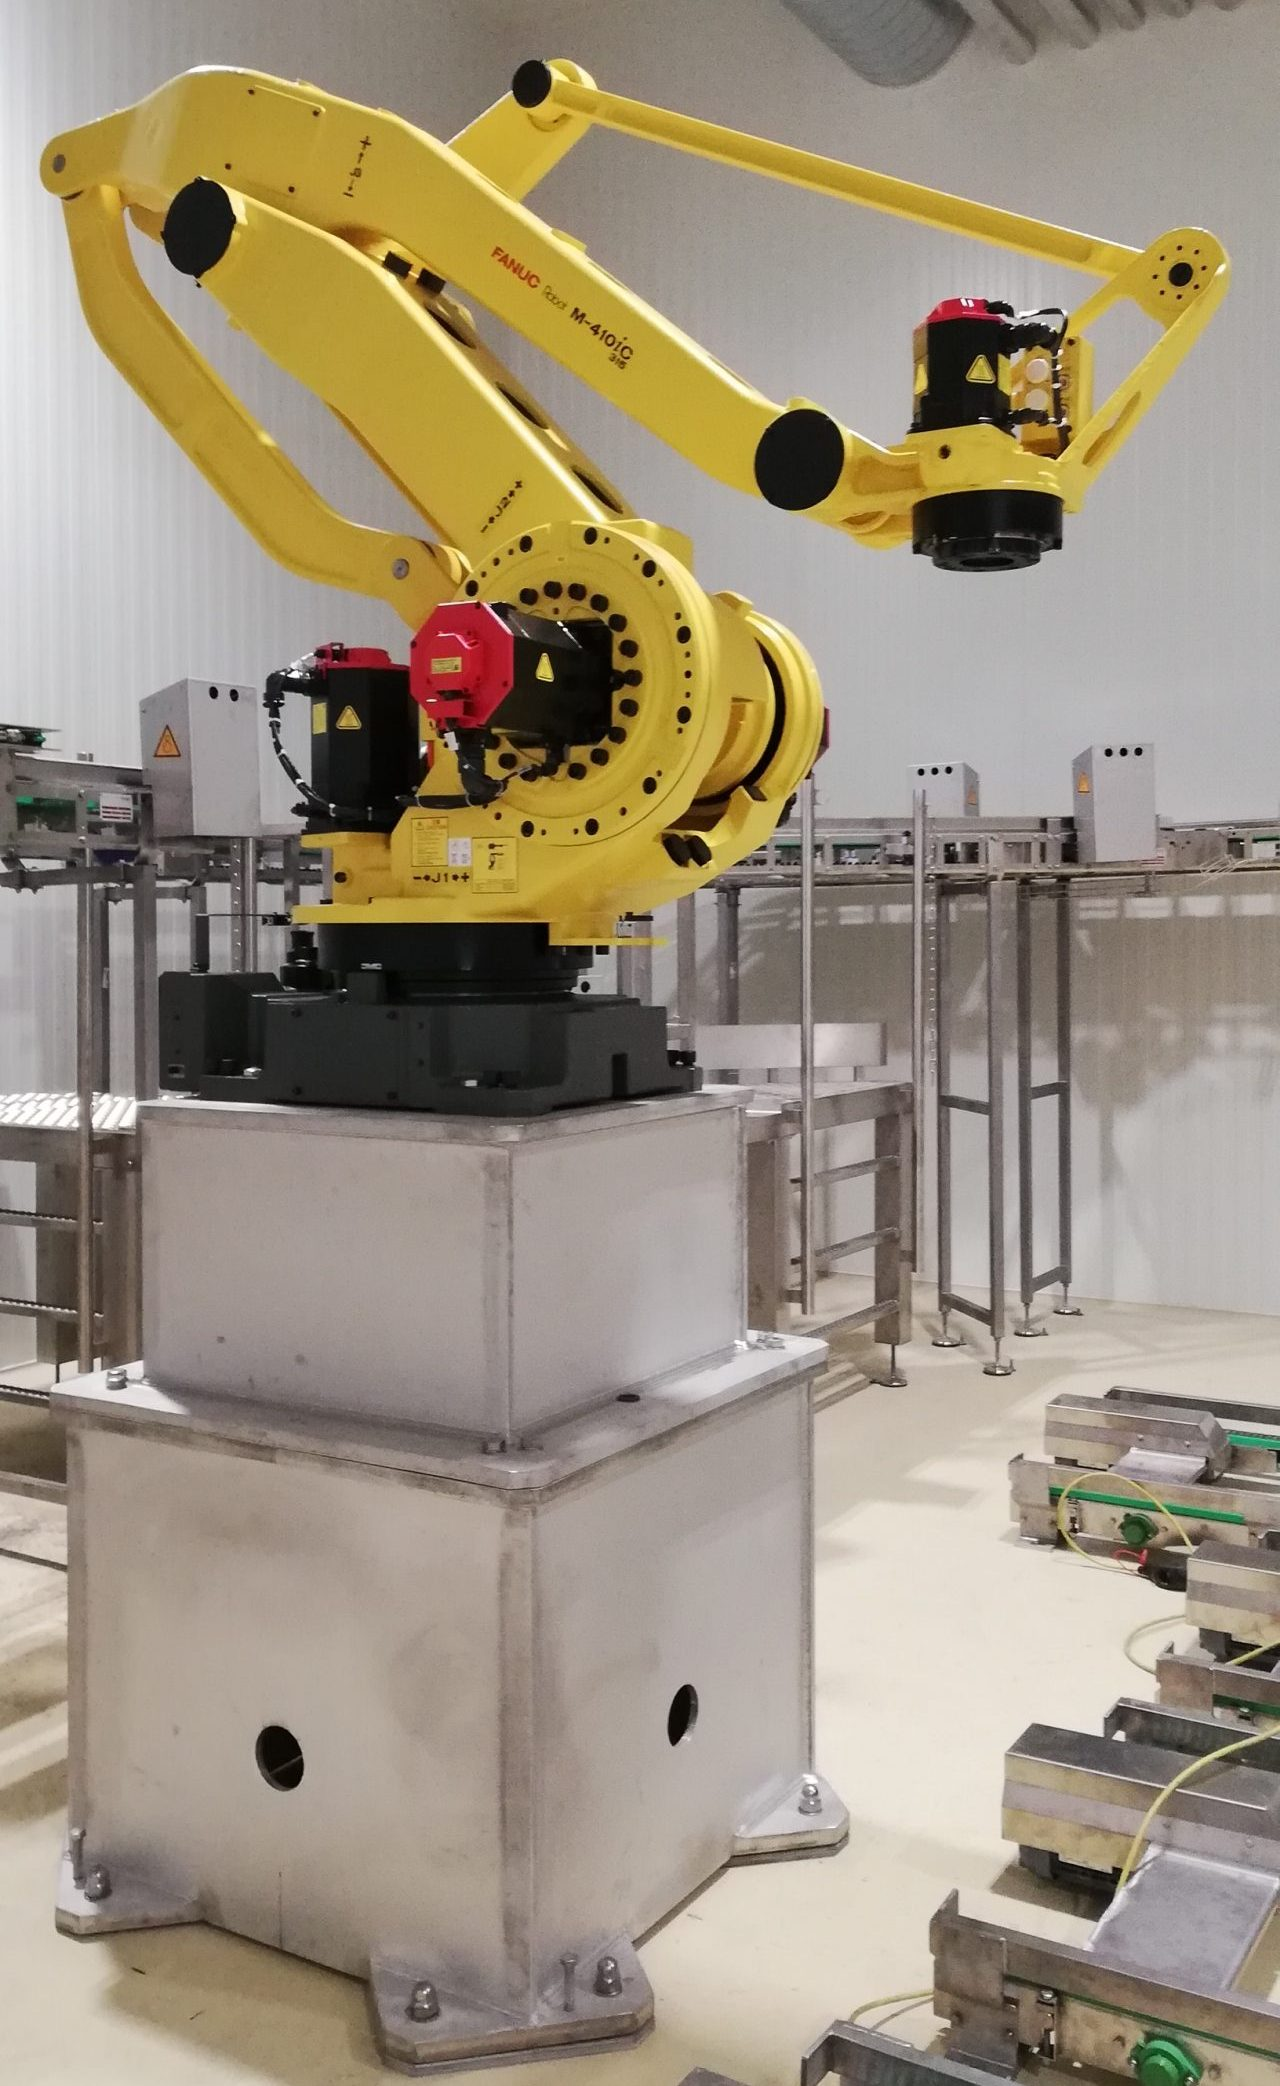 robot base (food processing)